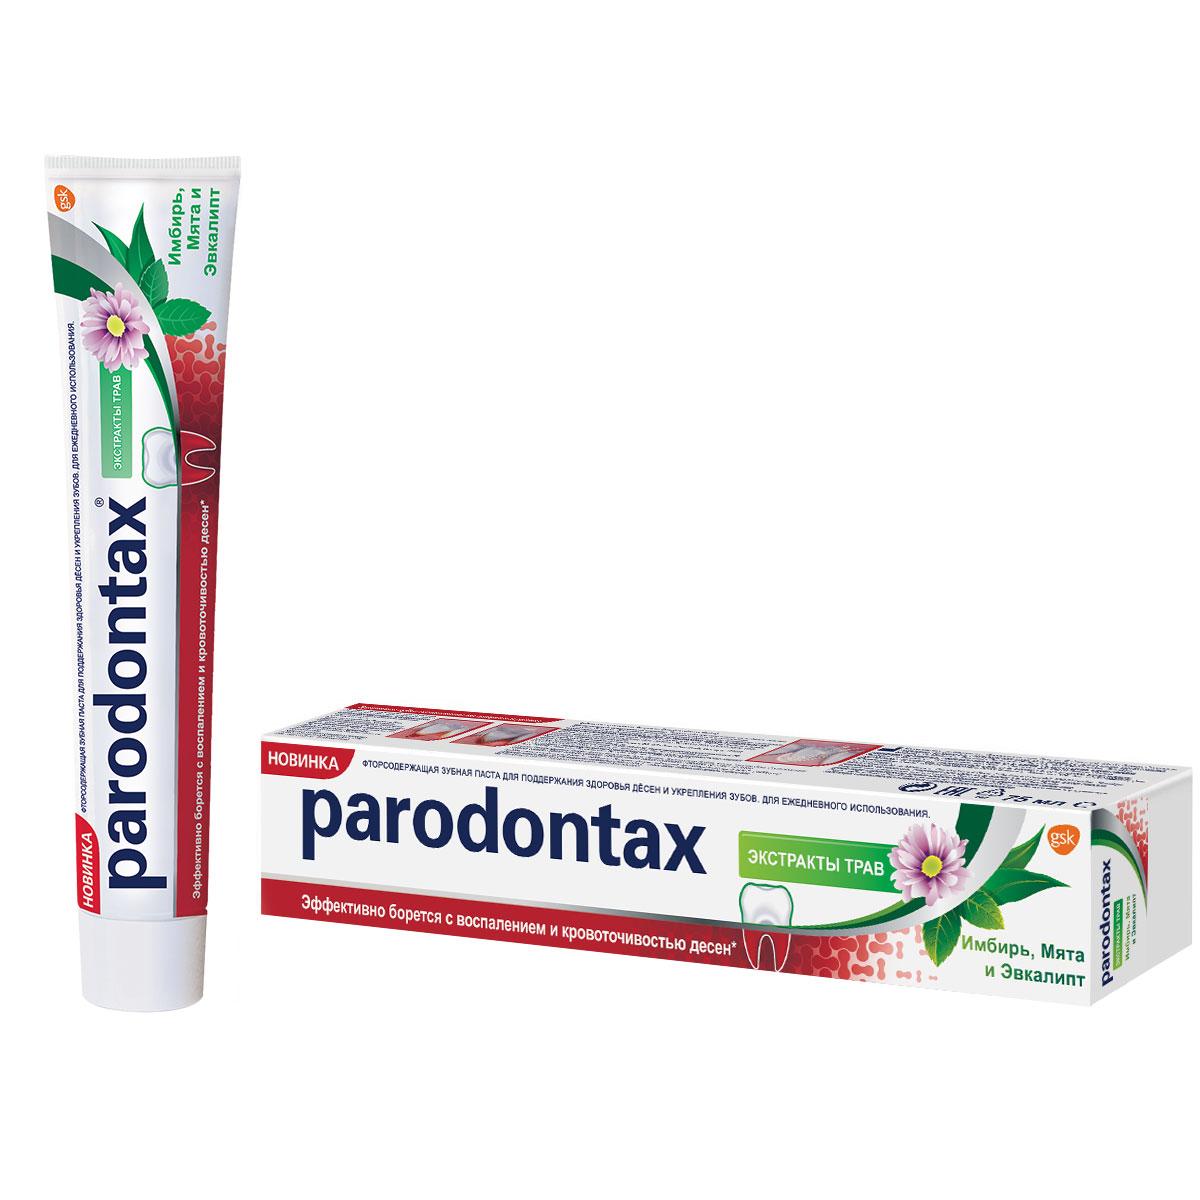 Зубная паста Parodontax Экстракты Трав 75 мл